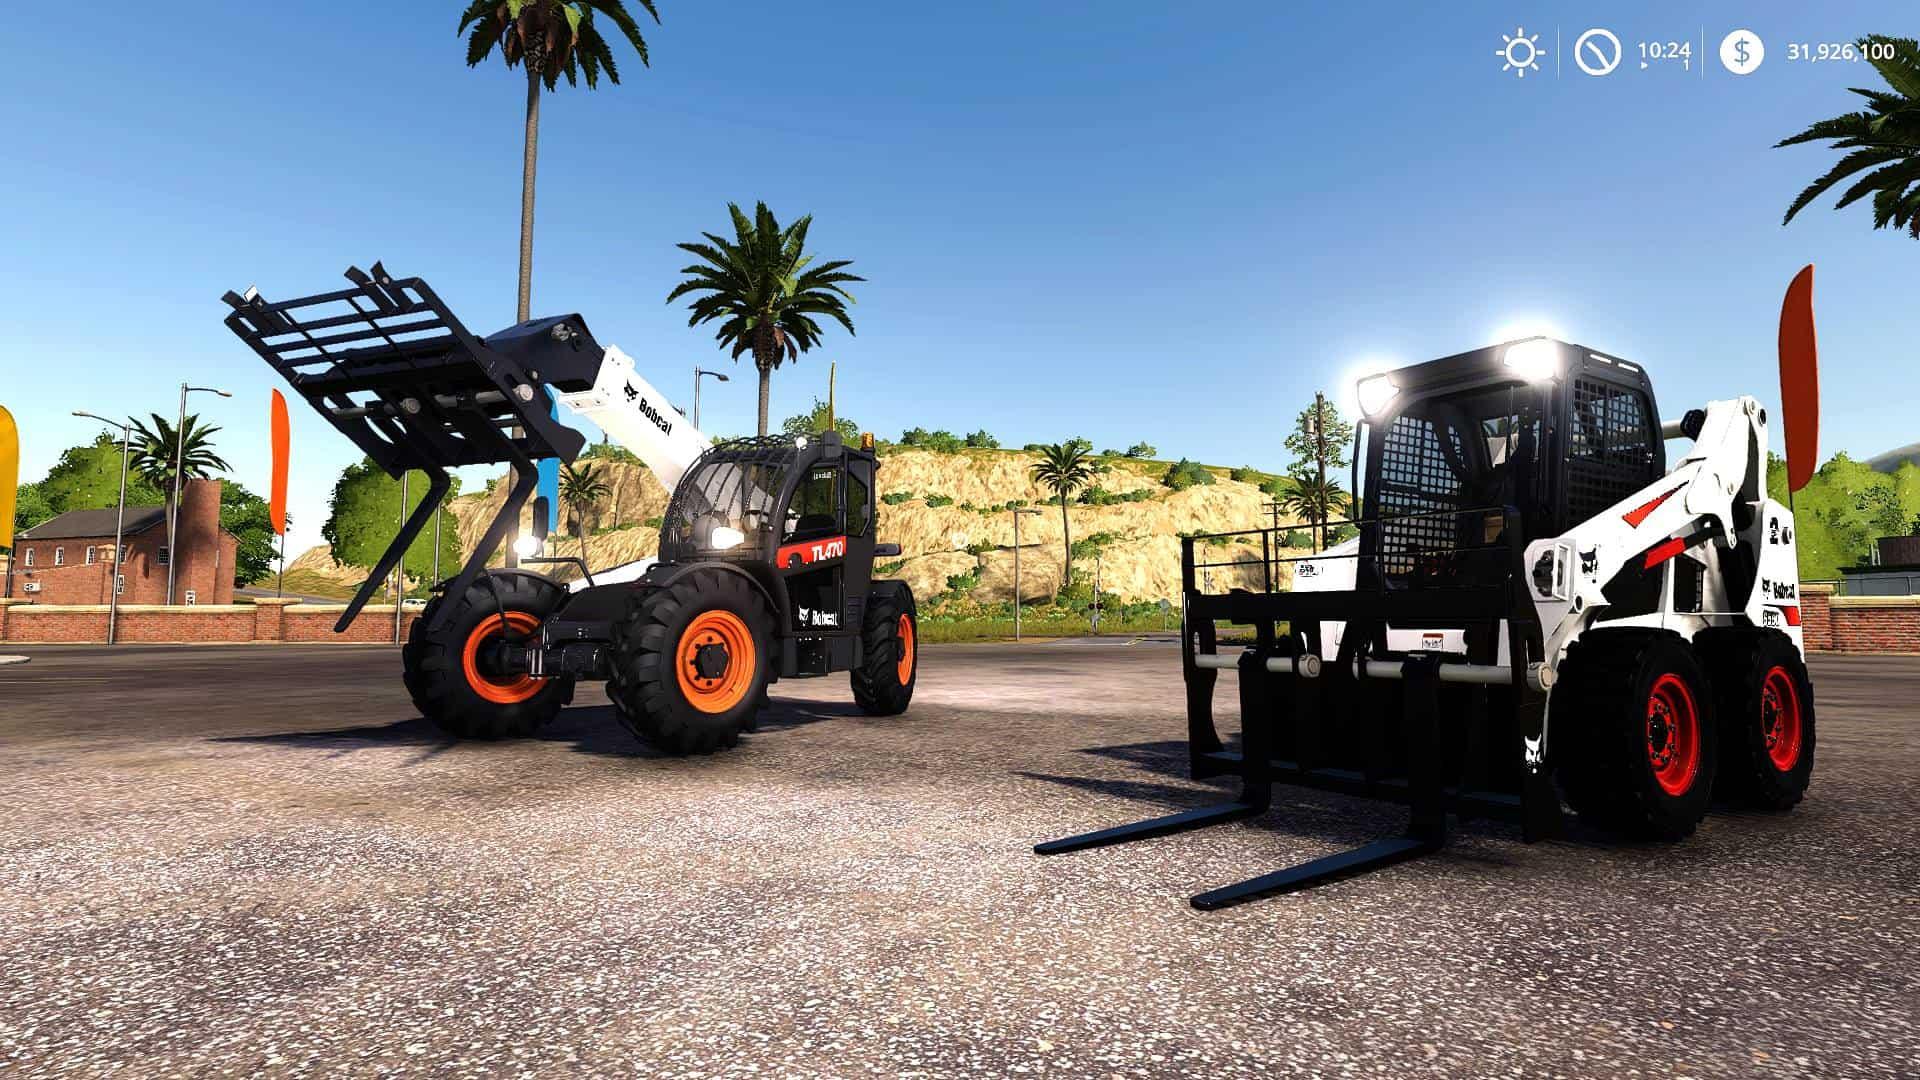 Bobcat 590 and Bobcat SkidSteer - Farming Simulator 19 Mod